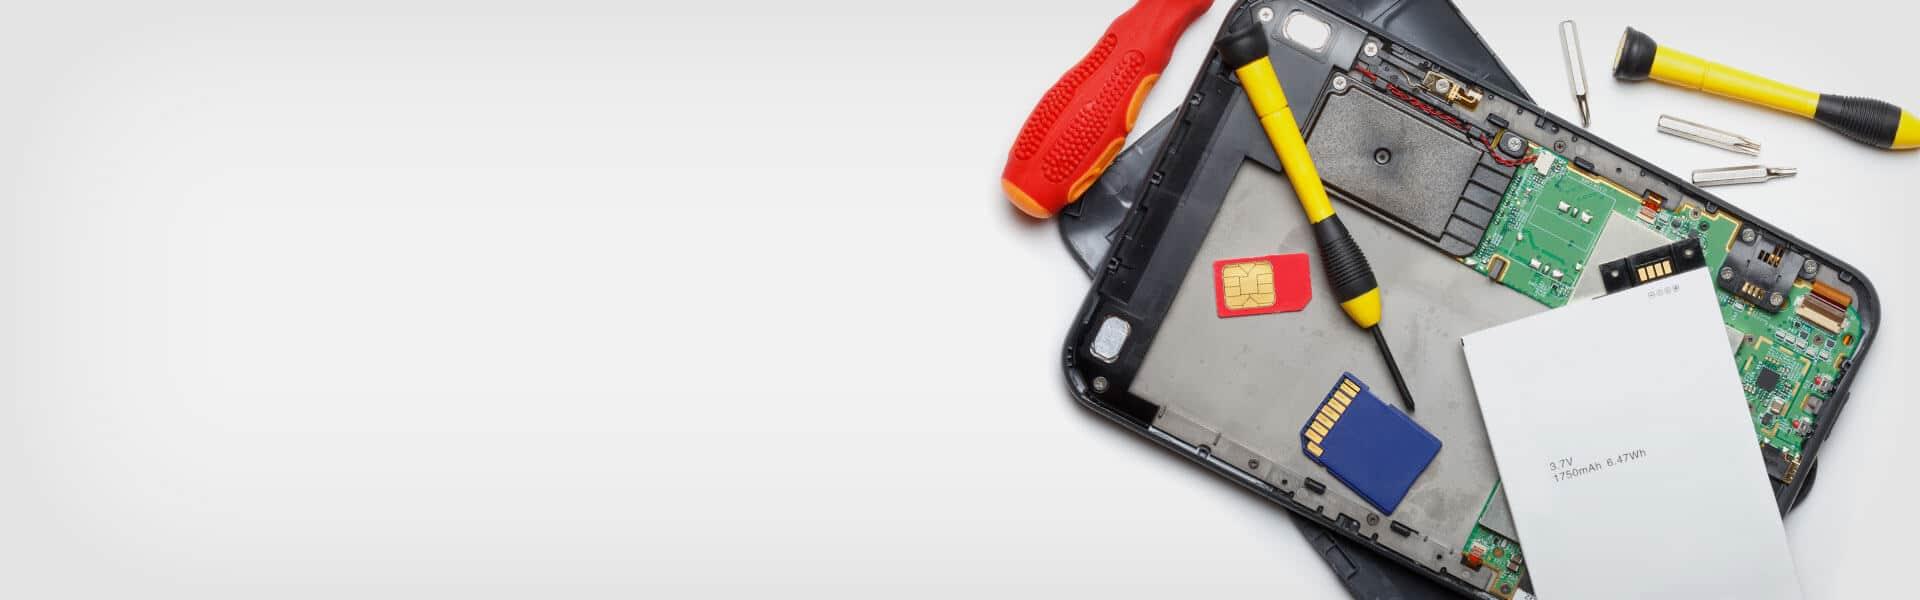 Reparatur express Handy münchen